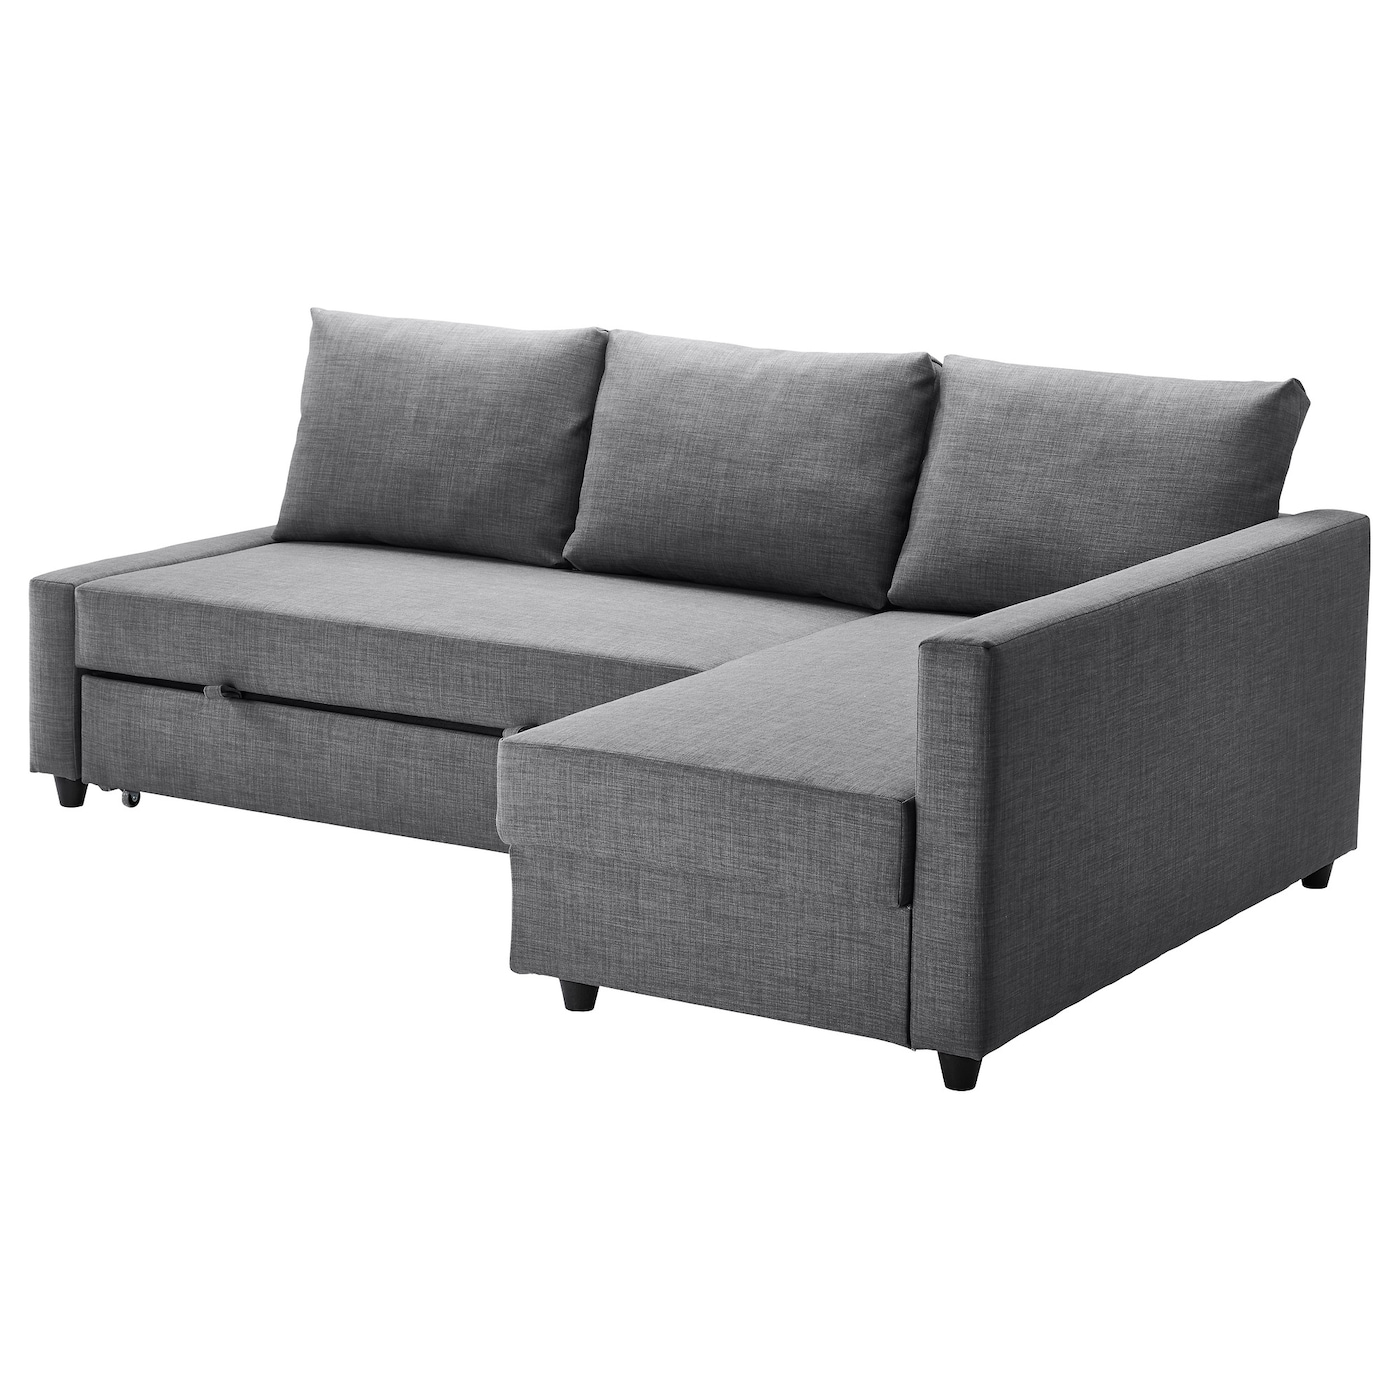 Corner Sofa Bed With Storage Friheten Skiftebo Dark Grey